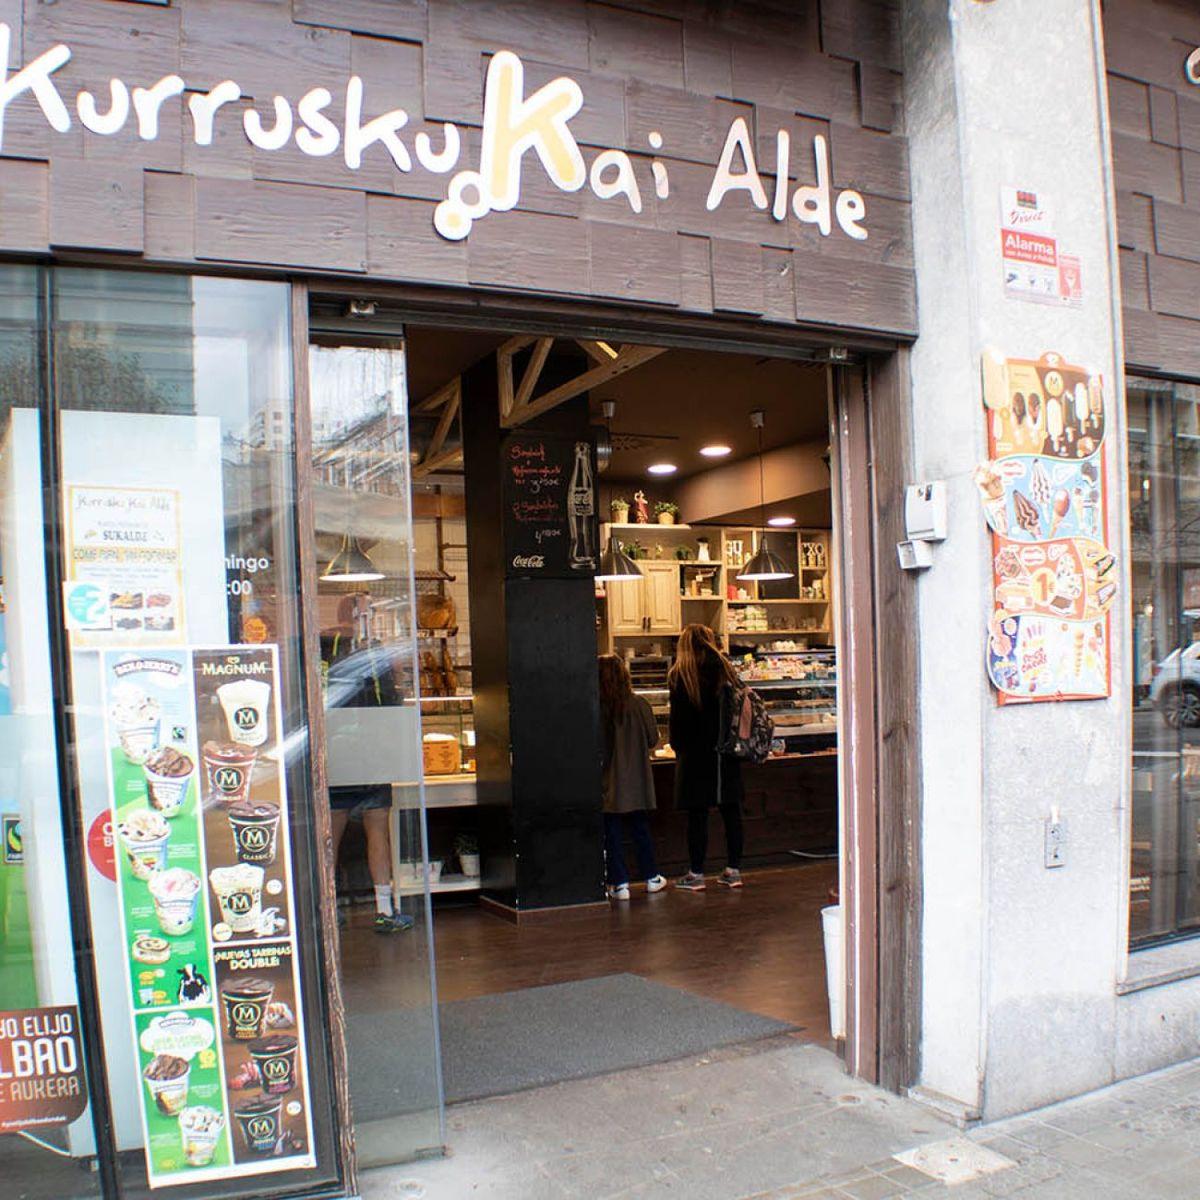 Kurrusku Kai Alde panaderia pastelería en Bilbao